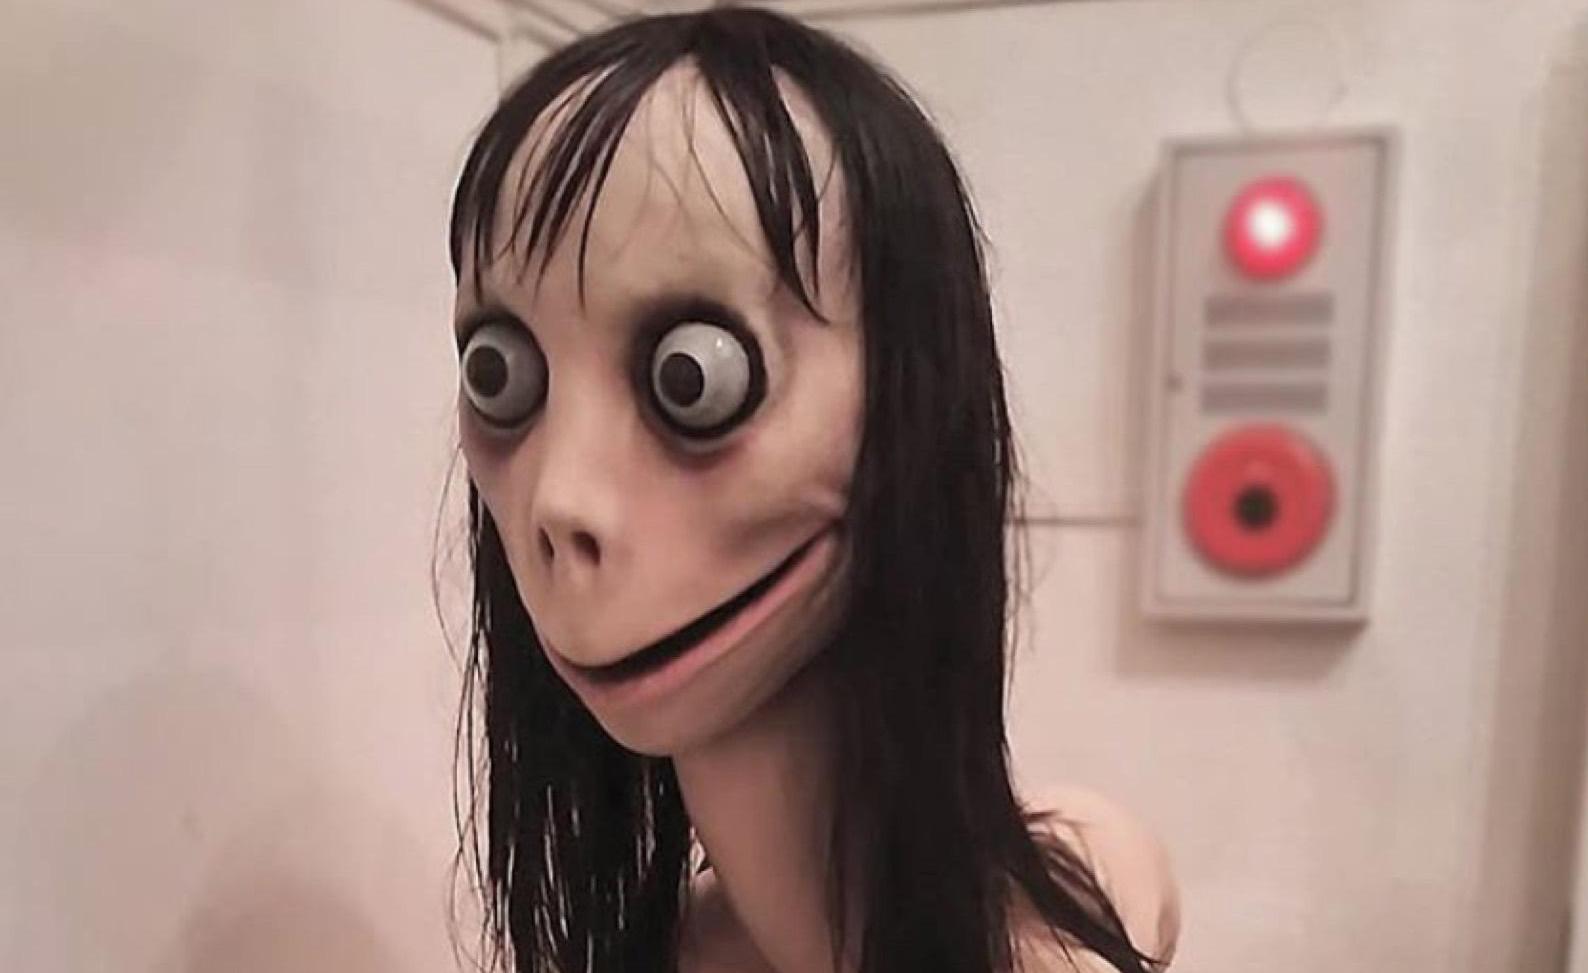 Momo Challenge picture